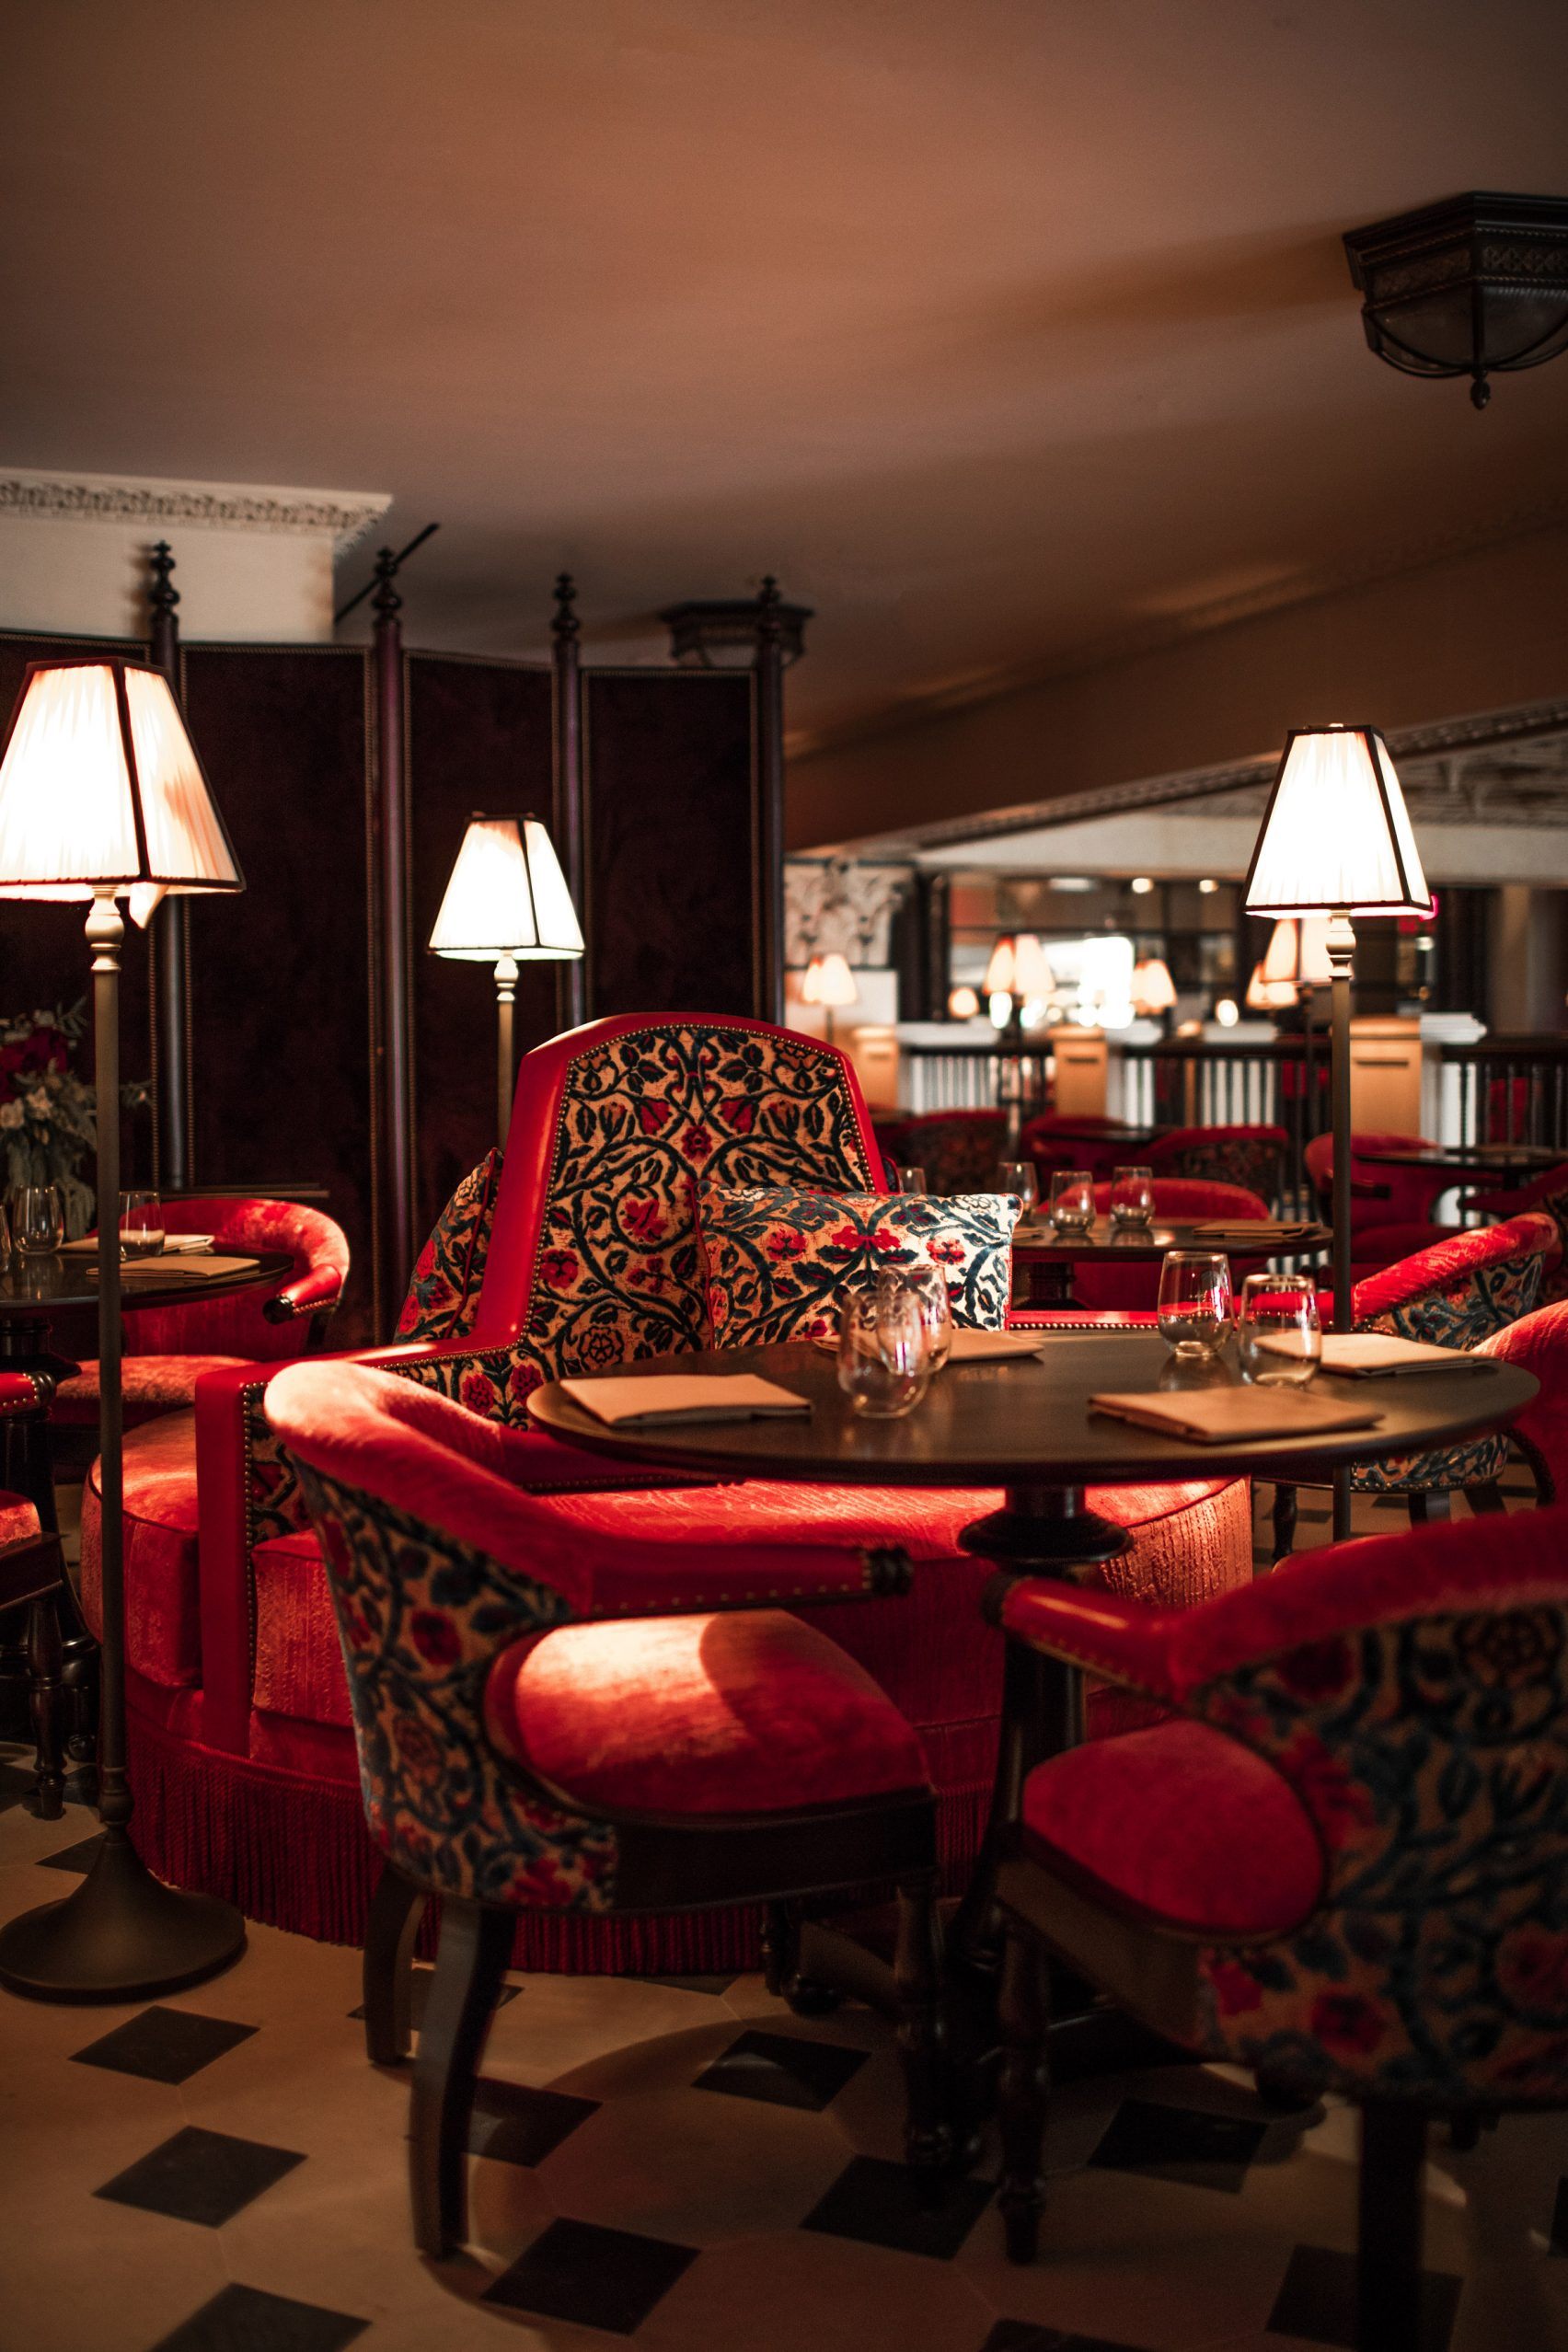 nomad-hotel-los-angeles-jacques-garcia-usa-interiors_dezeen_2364_col_8-1704x2556